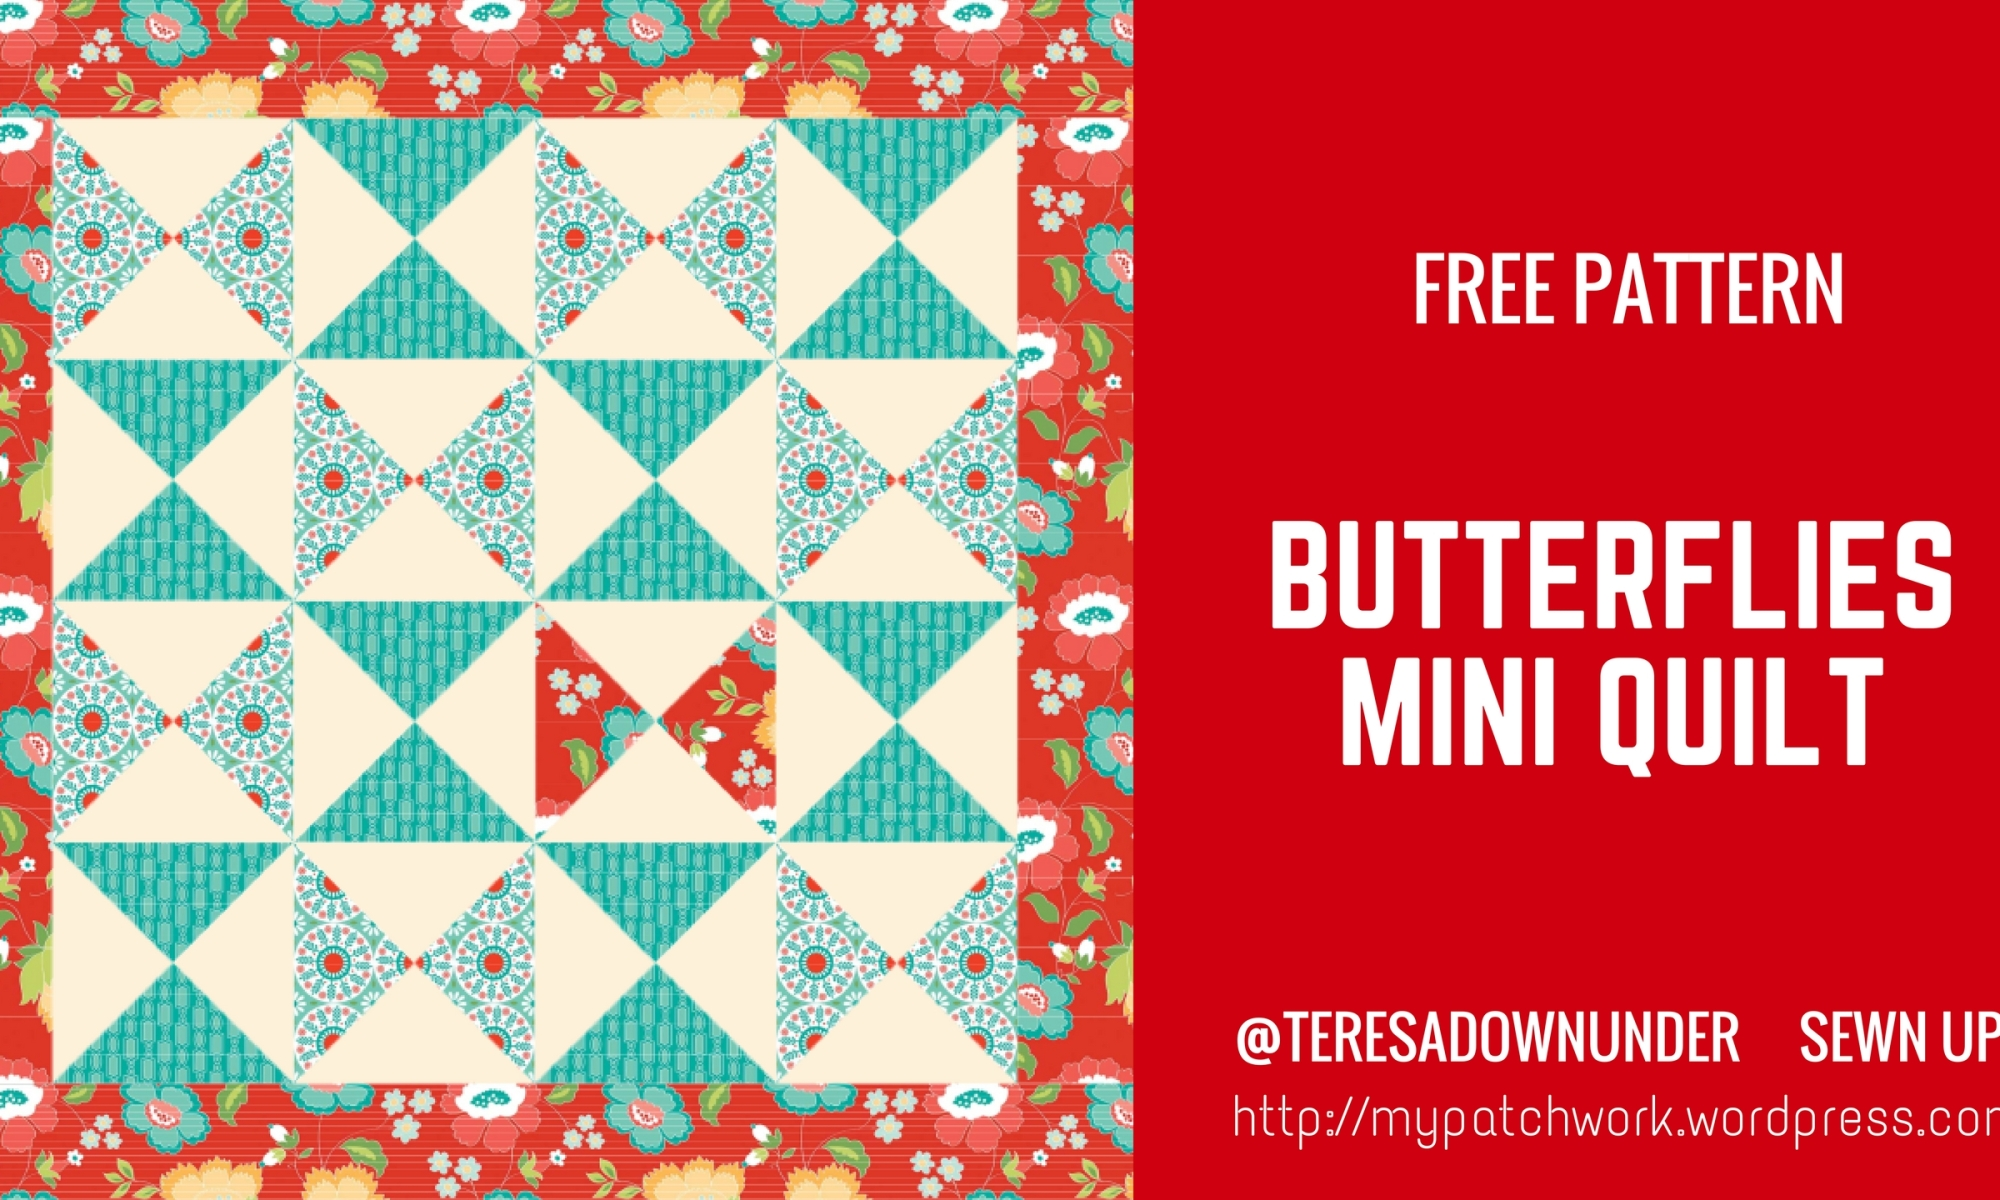 Free pattern: Butterflies mini quilt